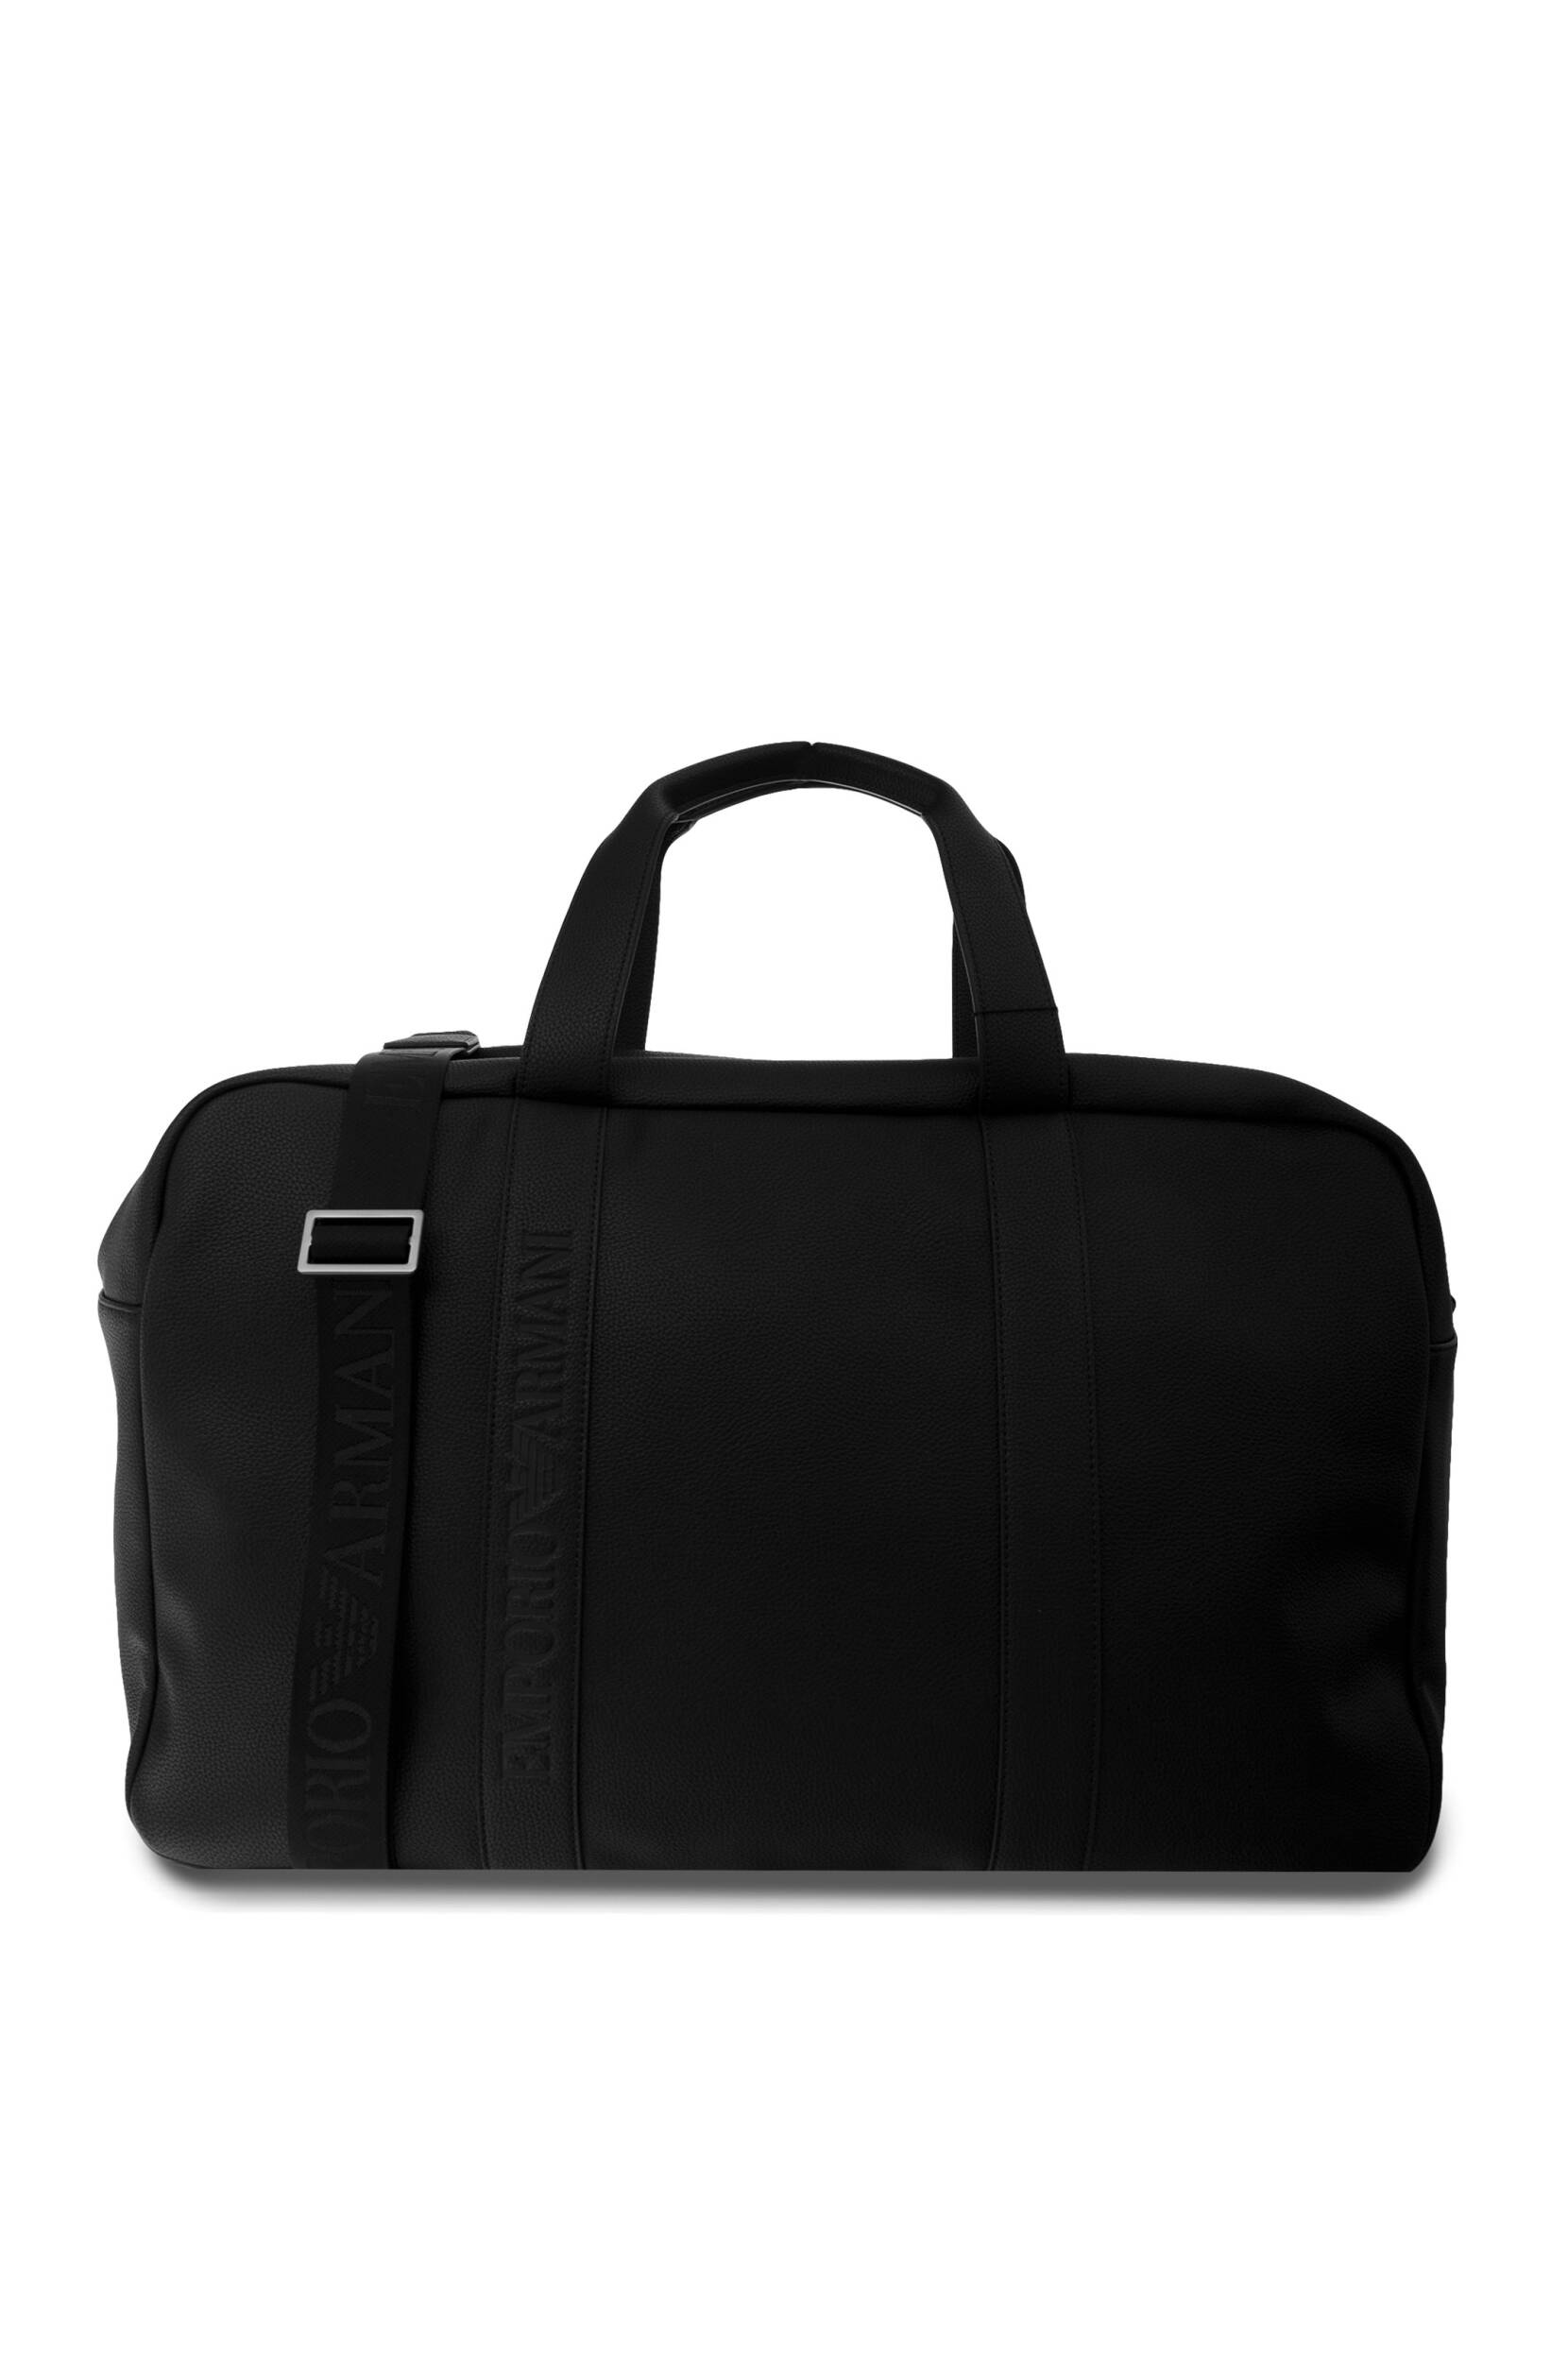 Travel bag Emporio Armani  4e941d0a73c7a